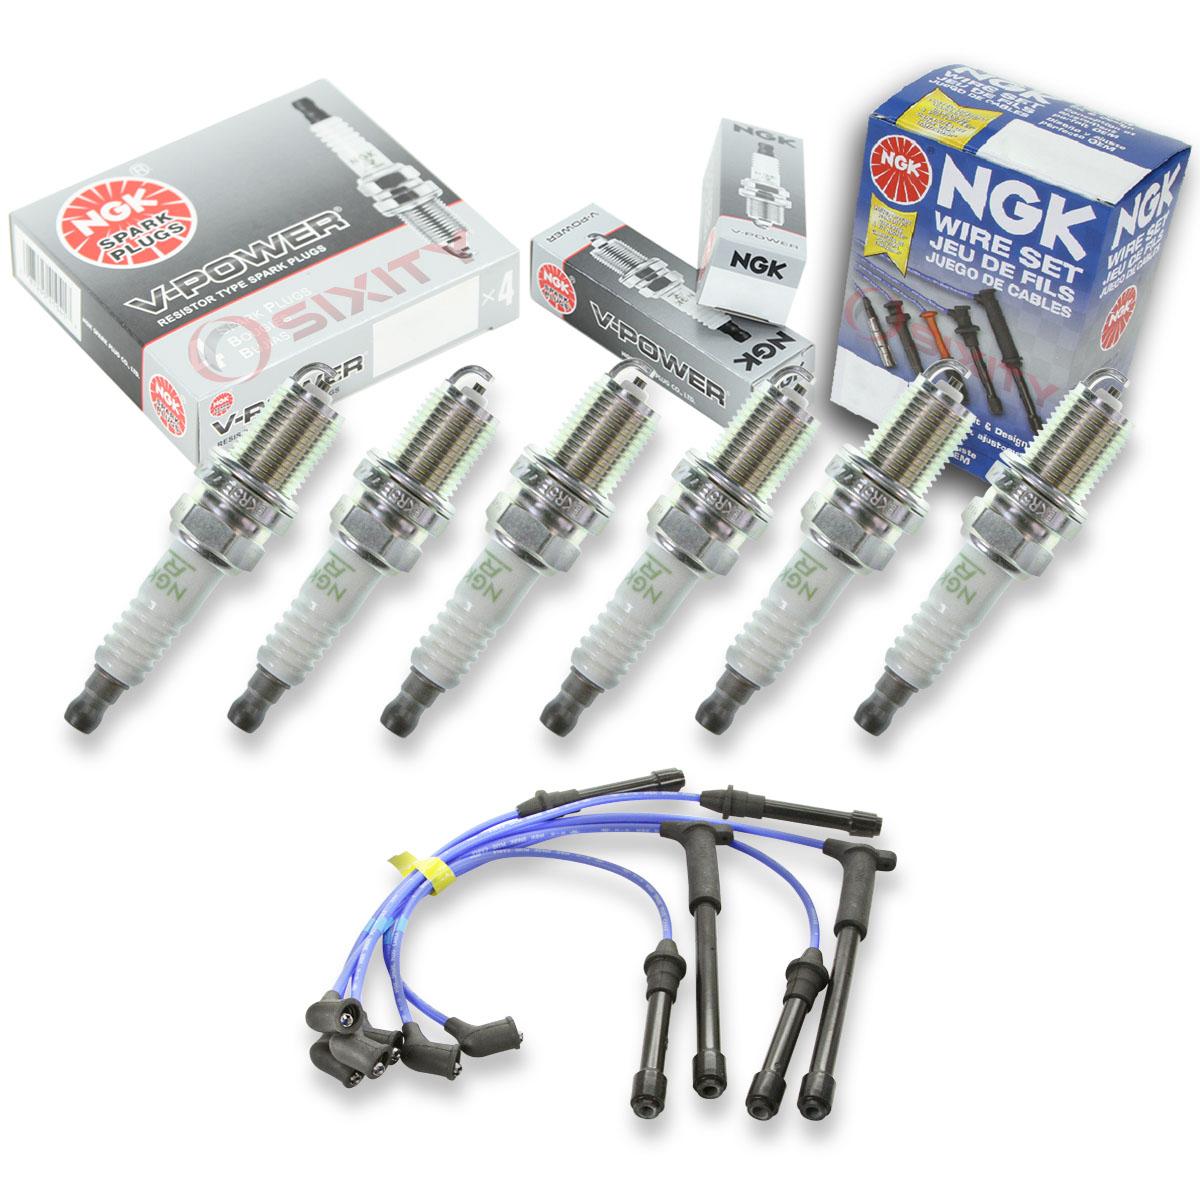 6 pcs NGK V-Power Plug Spark Plugs /& Wires 02-04 for Nissan Xterra 3.3L V6 as